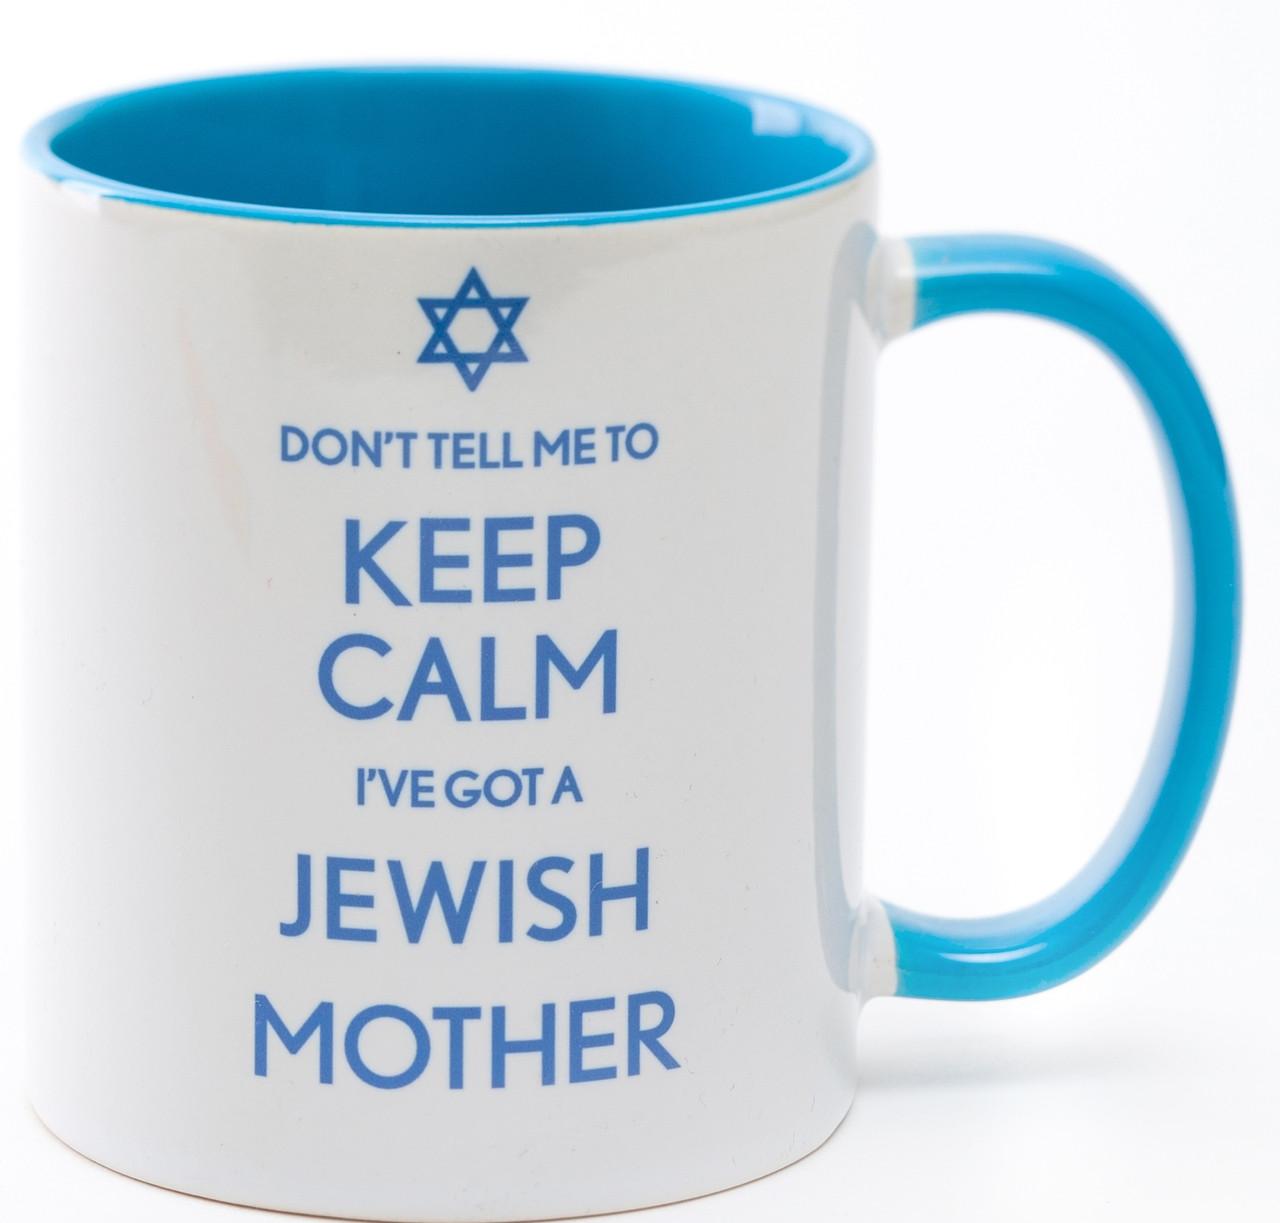 I/'m Jewish Funny Jewish Theme Embroidered Towel I Can/'t Keep Calm